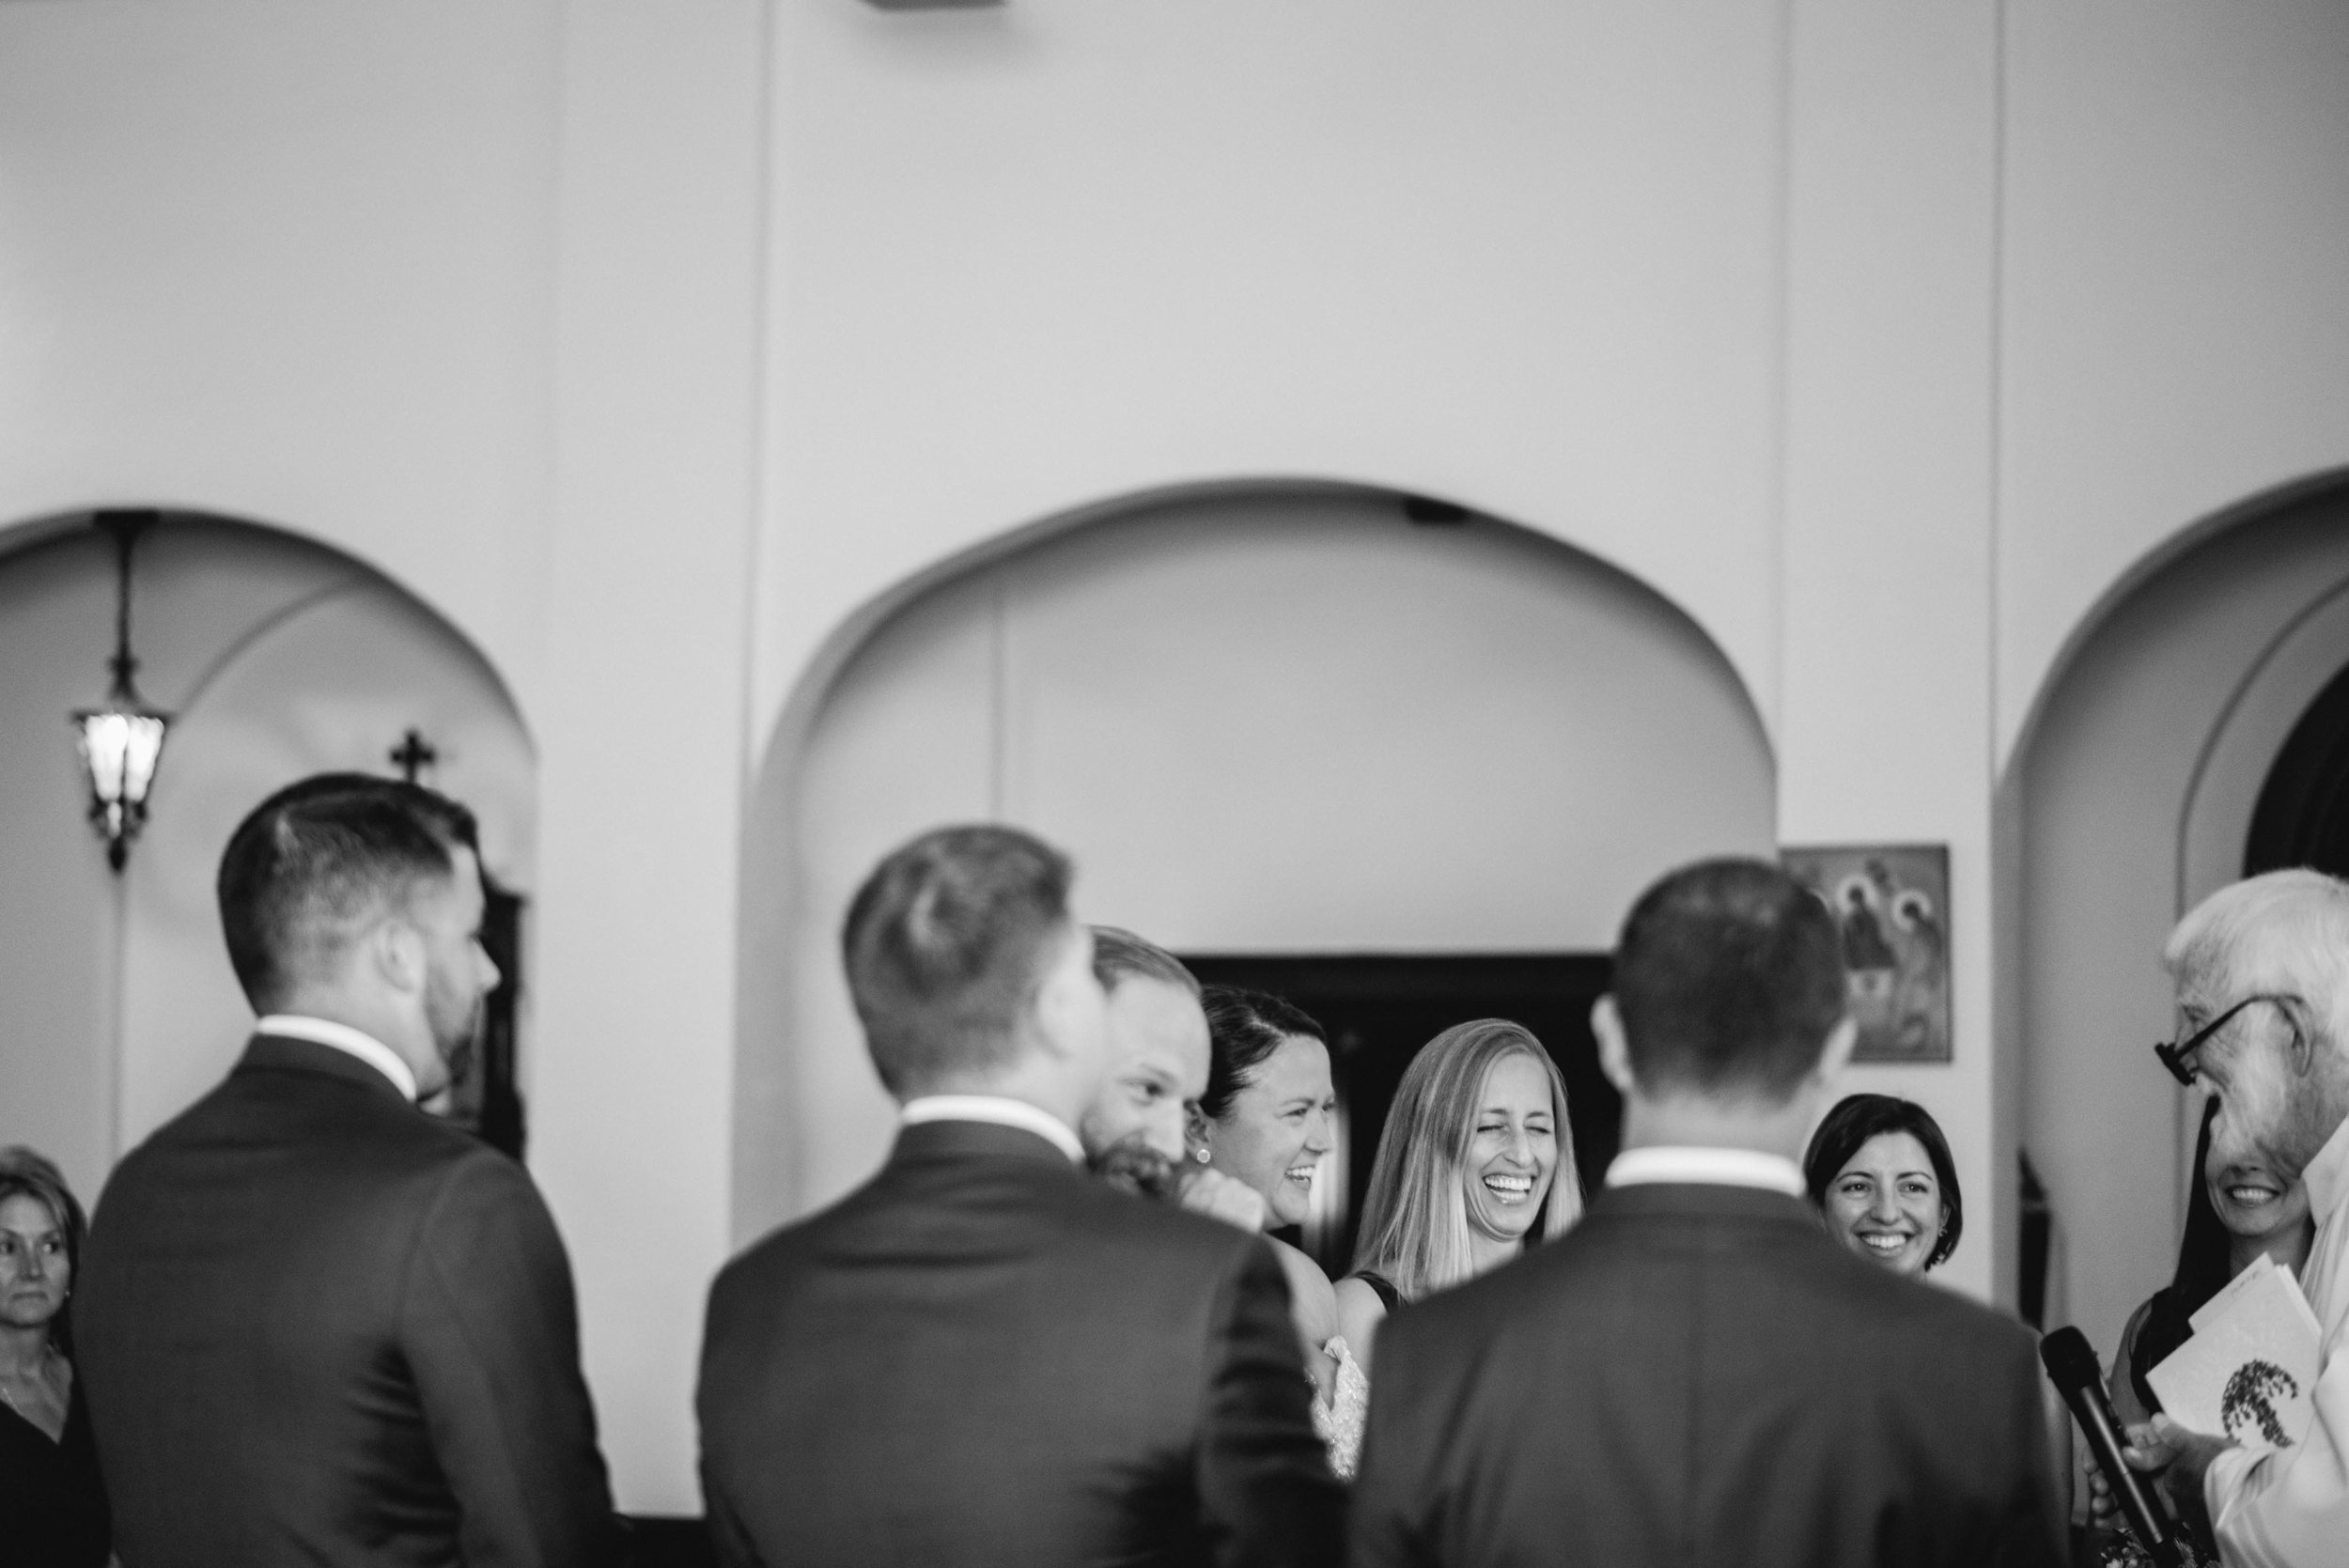 Marthas-vineyard-wedding-21.jpg